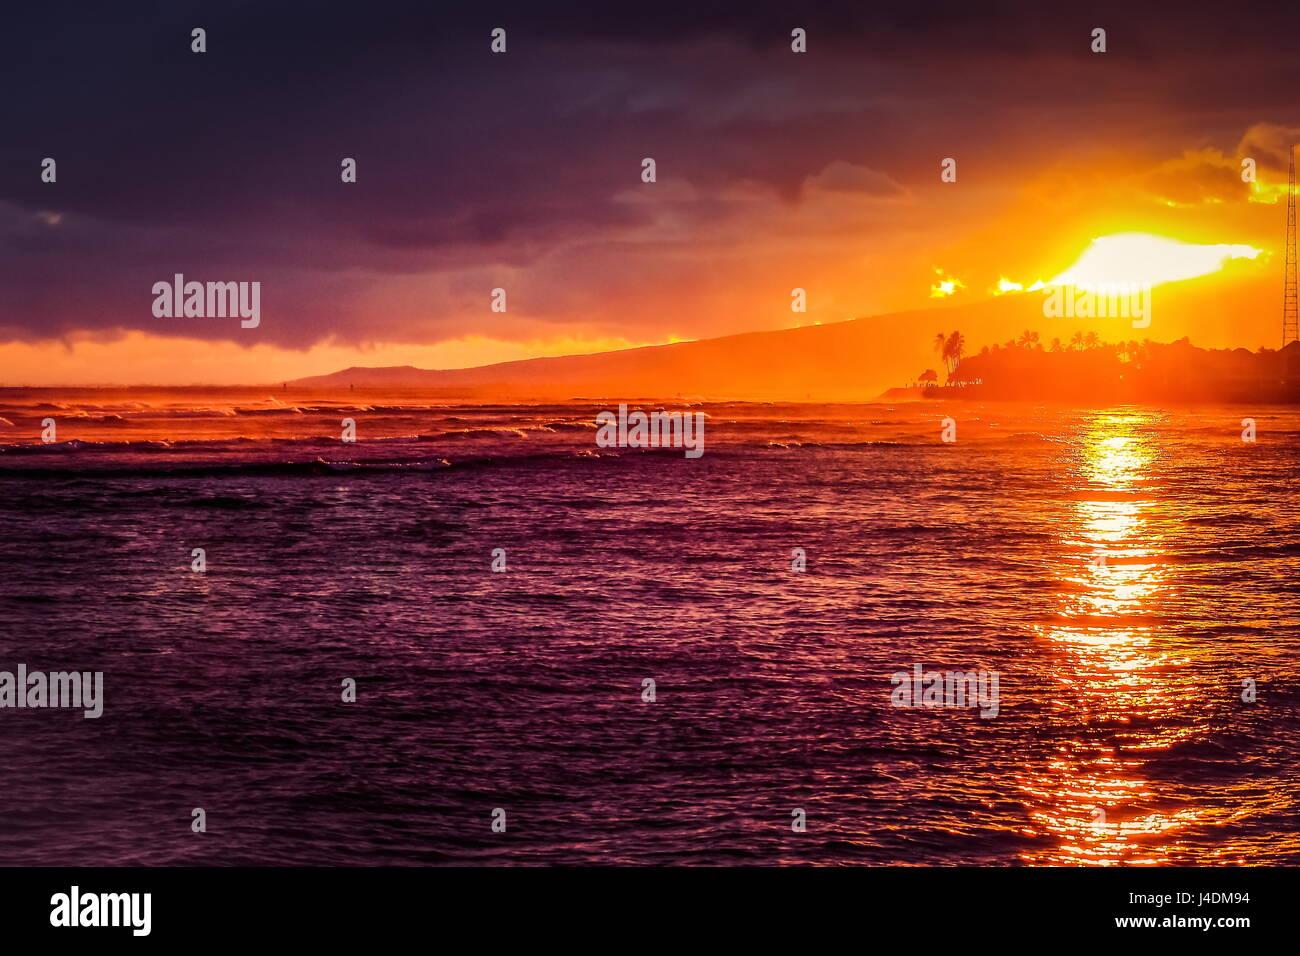 Sunset over Ala Moana Beach, Honolulu, Hawaii on Memorial Day 2016. Stock Photo